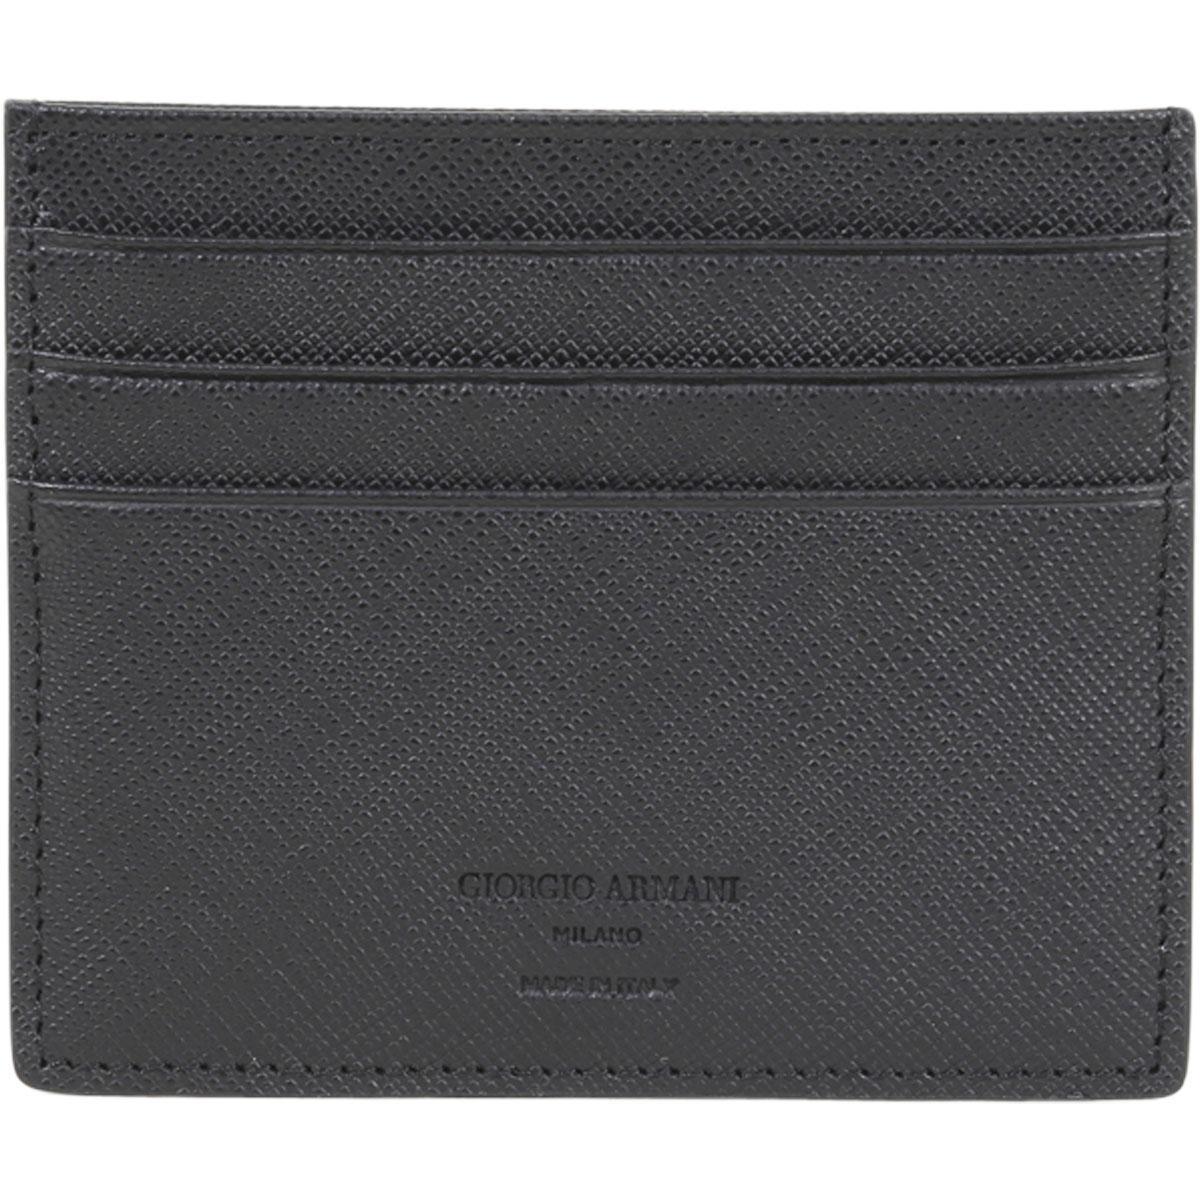 giorgio armani mens textured genuine leather card holder wallet - Leather Card Holder Wallet